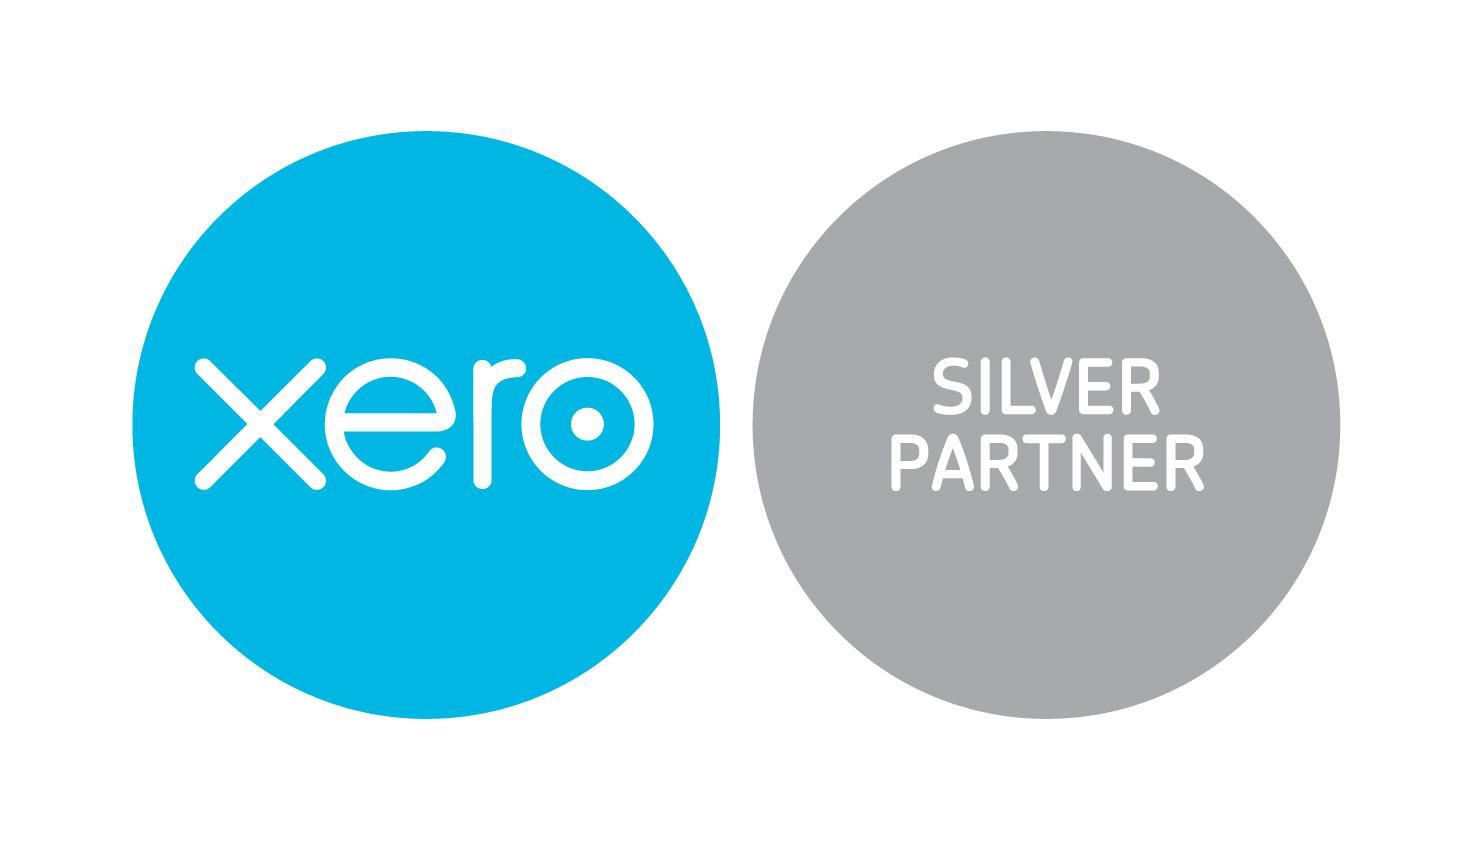 xero-silver-partner-logo-RGB.jpg